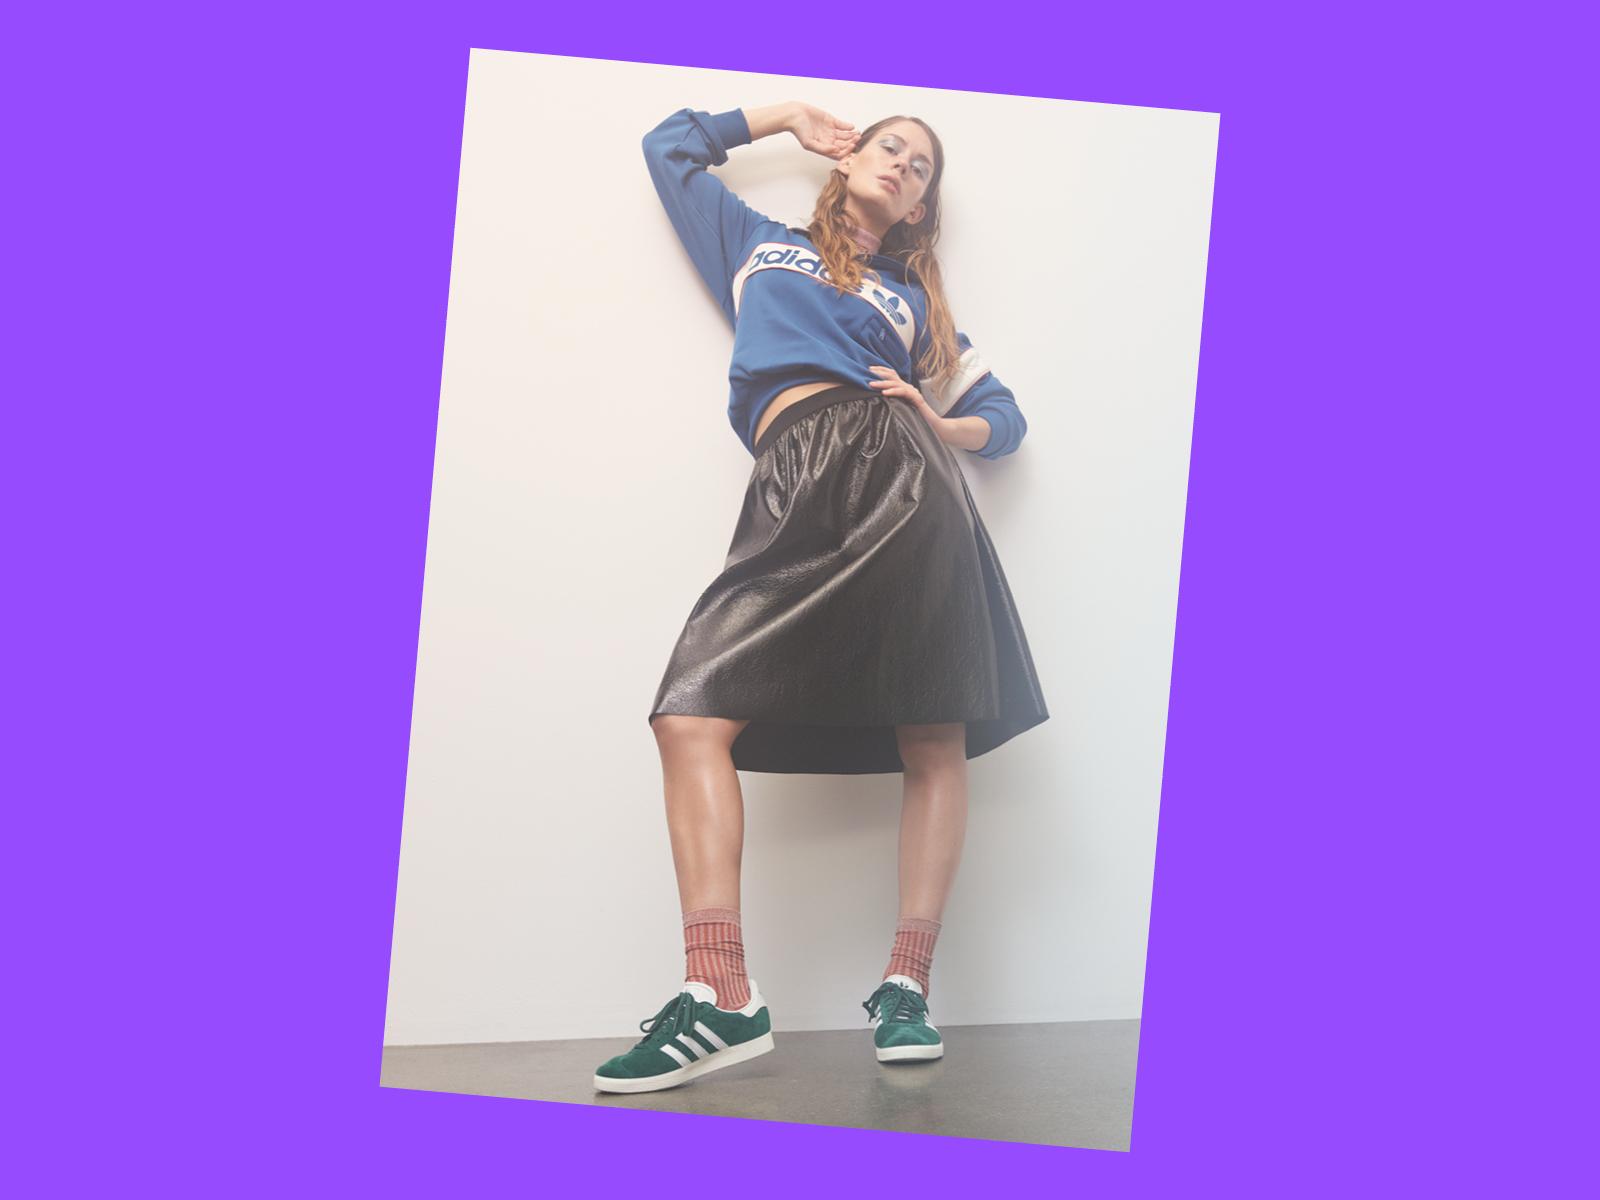 Adidas Gazelle Collage_1200x90022